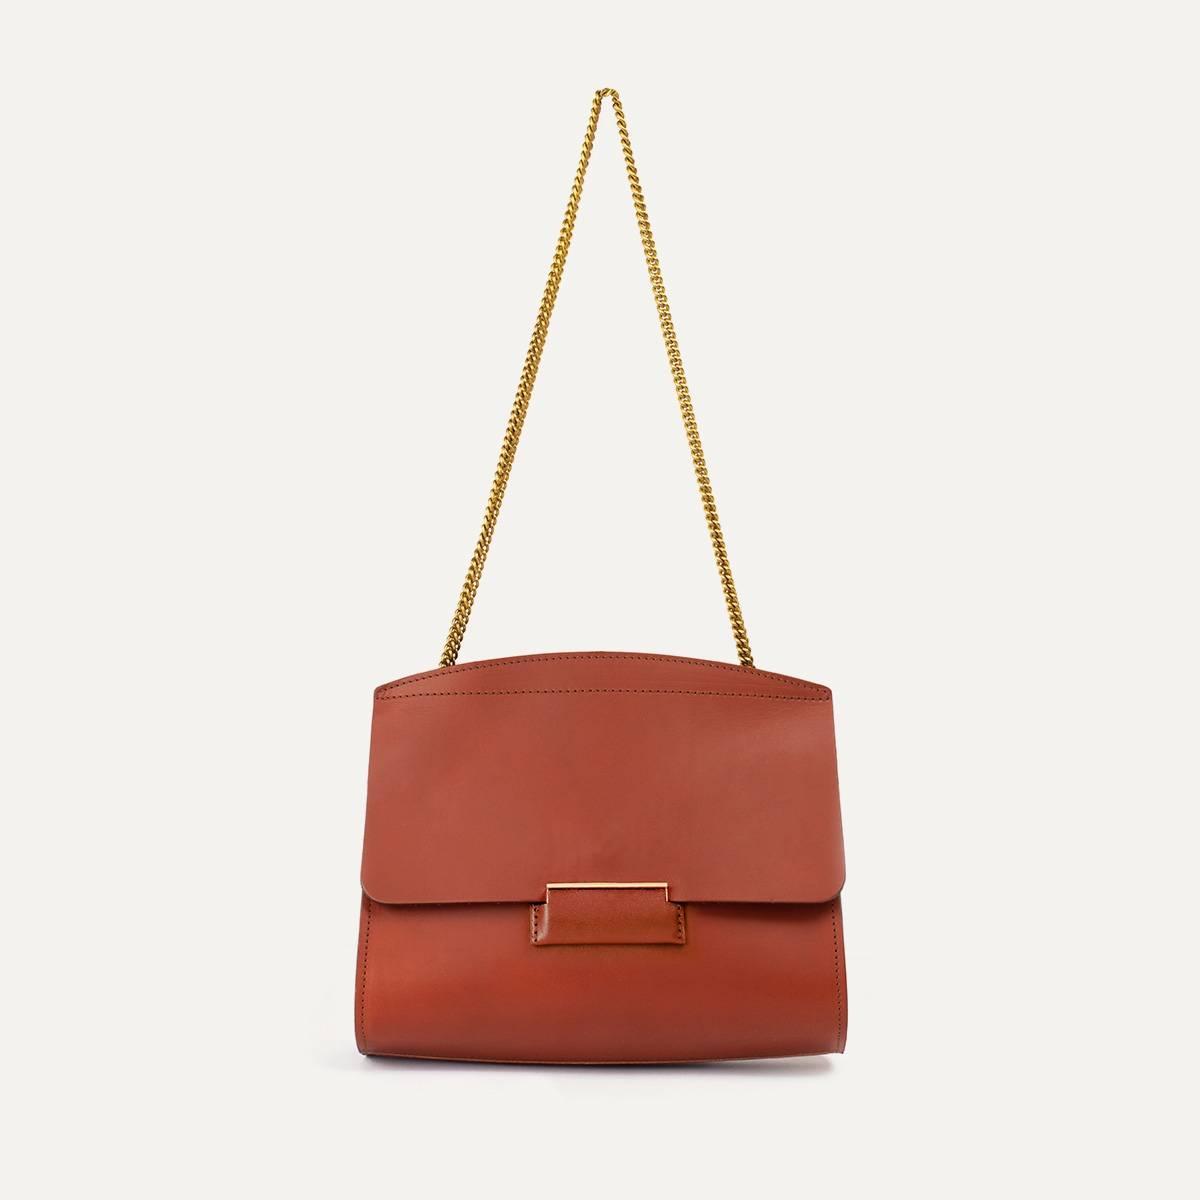 Origami S clutch bag - Rust (image n°1)